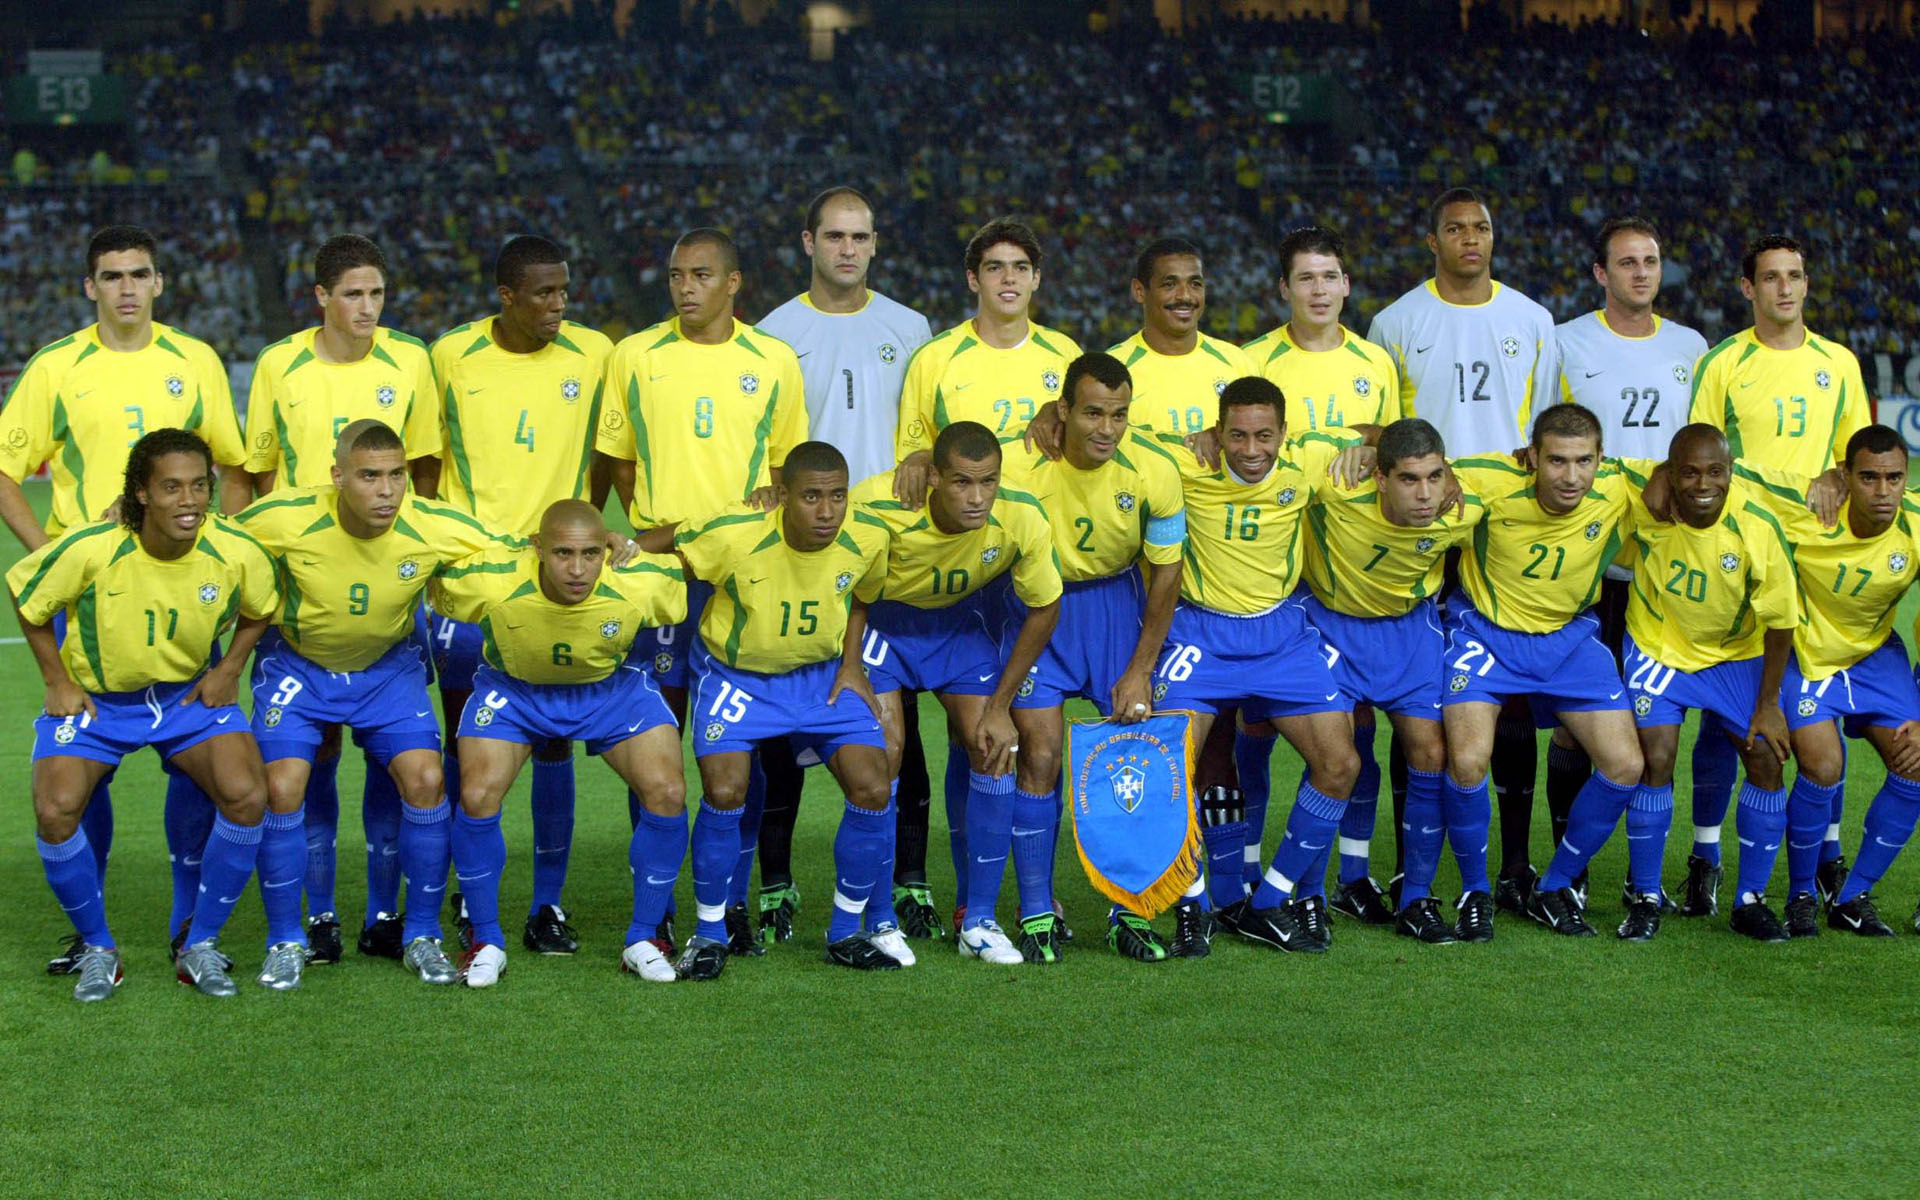 Resultado de imagen para brasil 2002